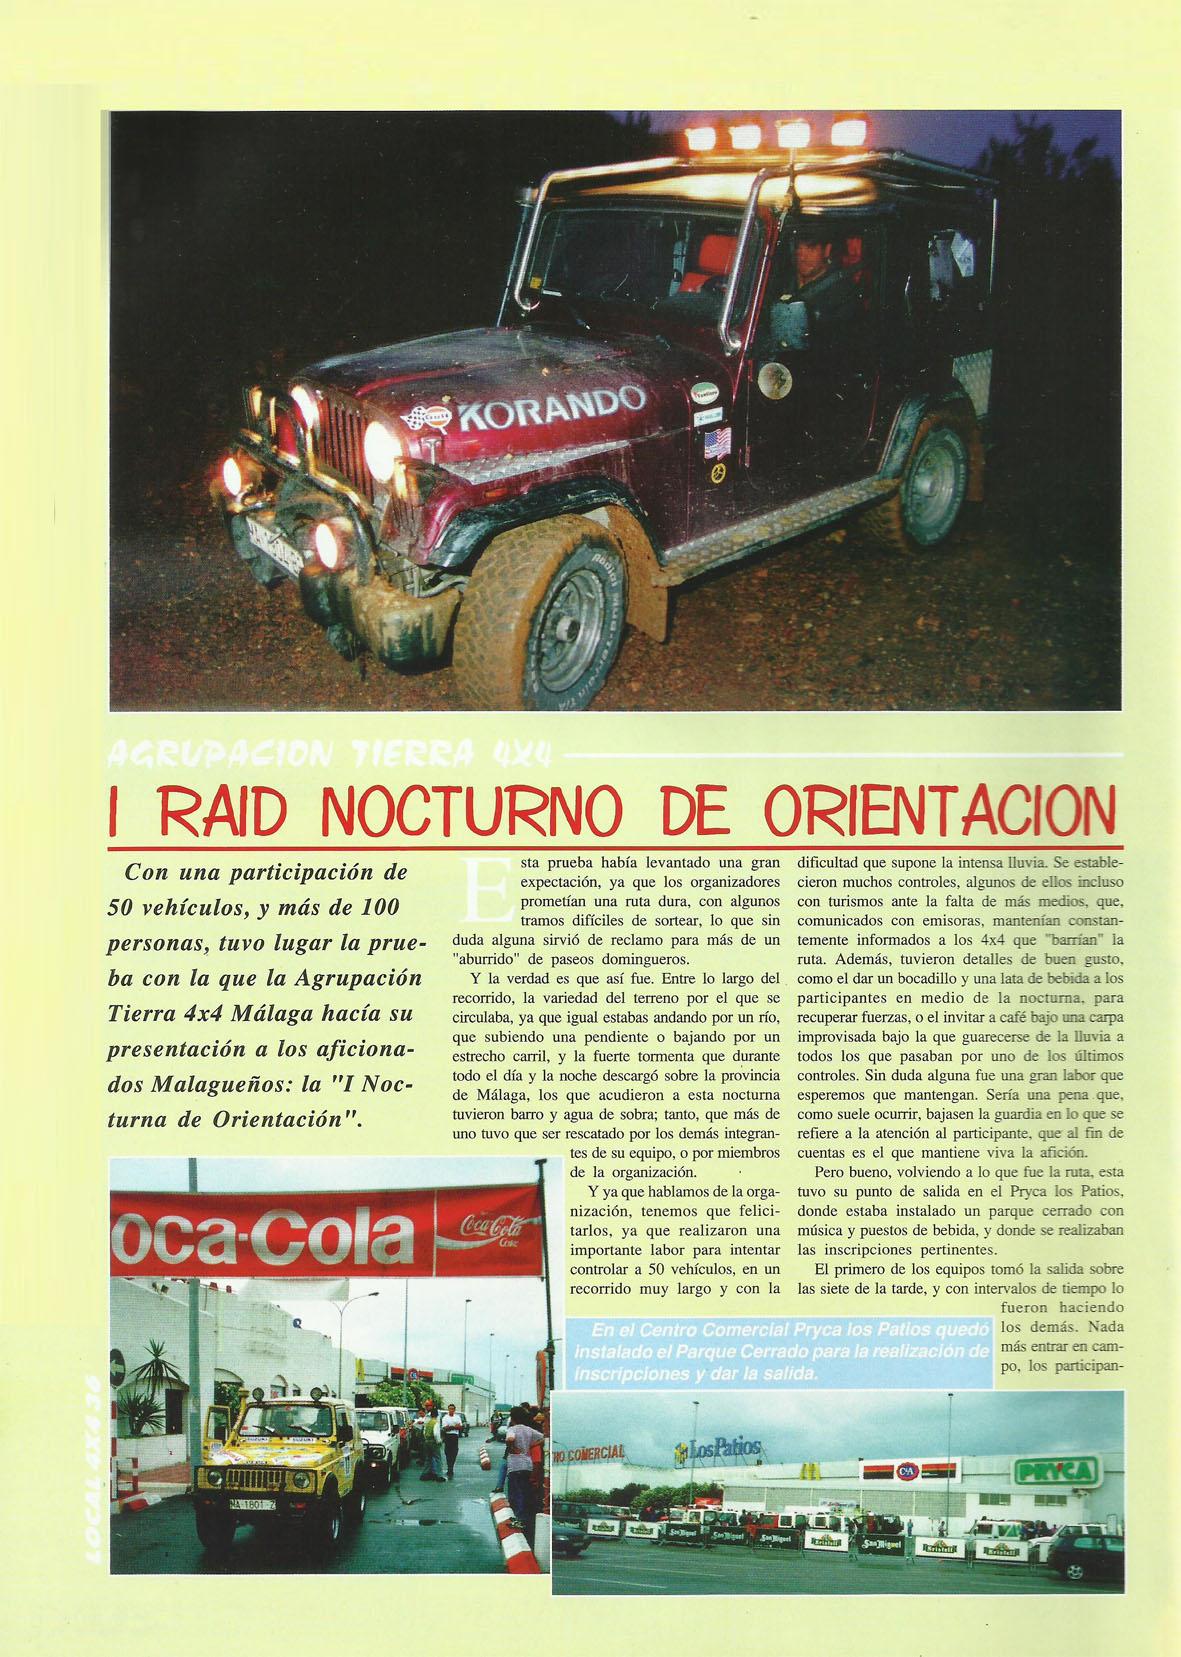 Revista Local 4x4 32 36 Actividades Realizadas I Rally Nocturno de Orientación